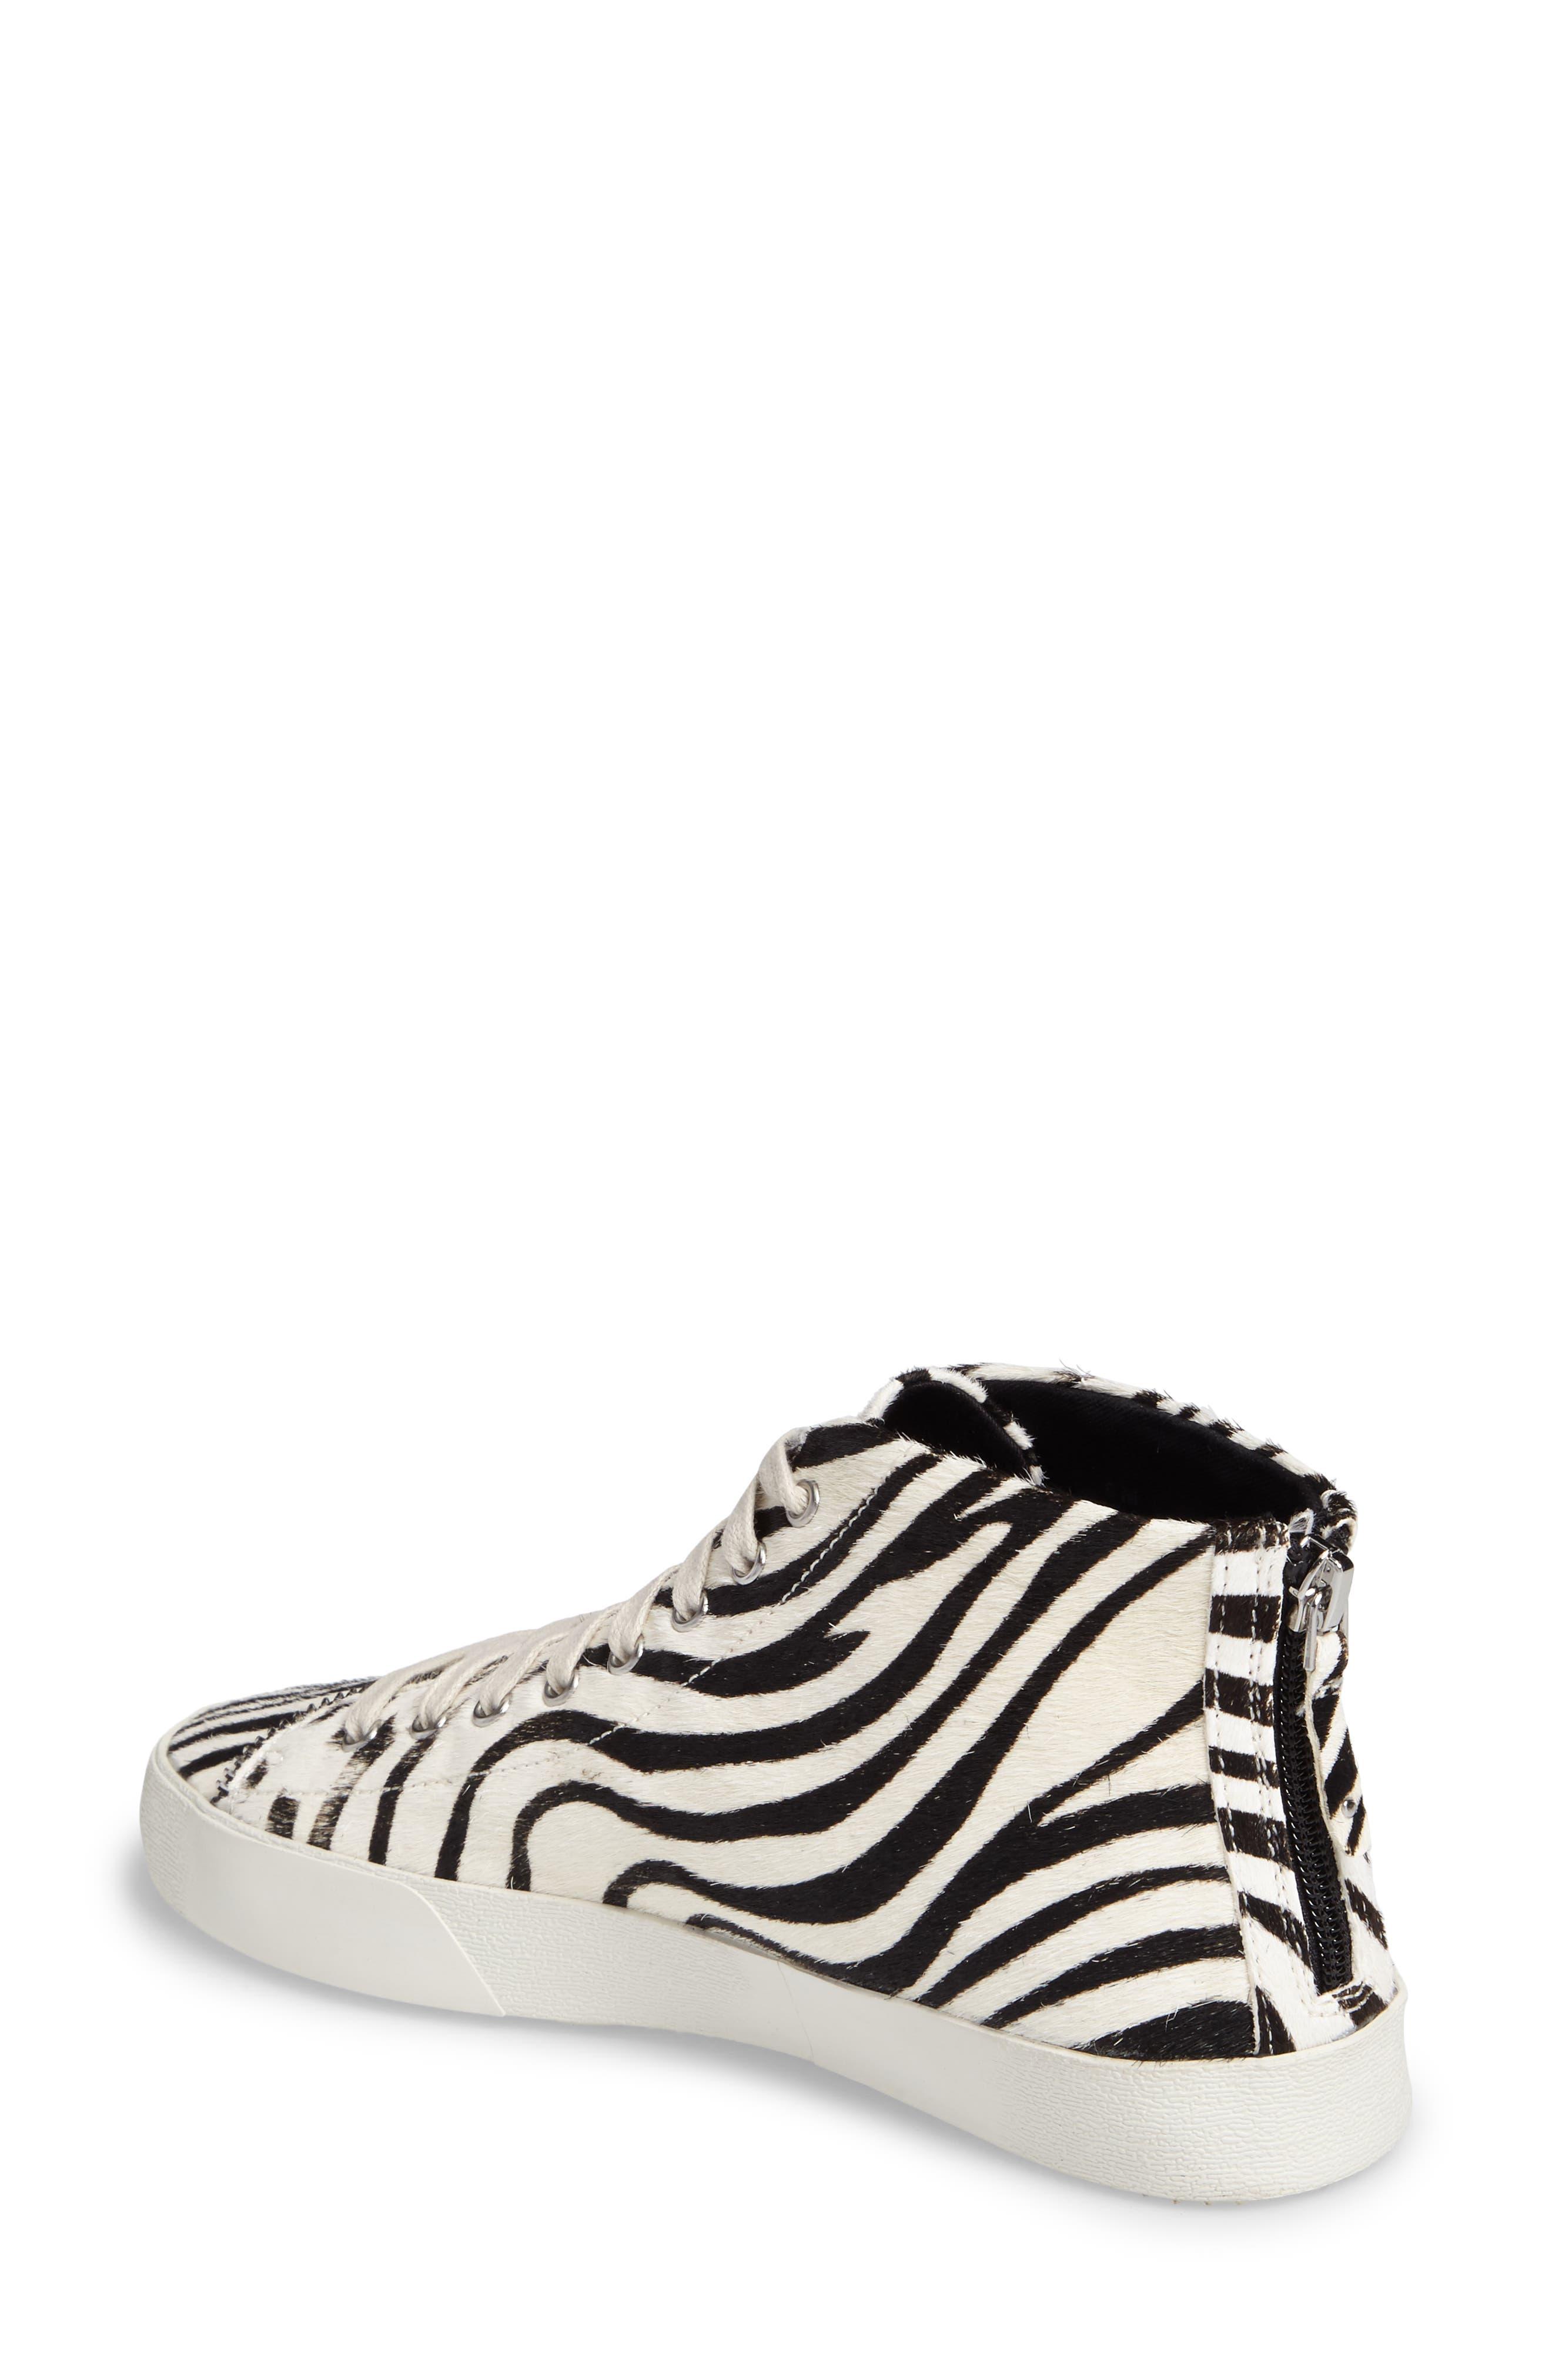 Zaina Too Genuine Calf Hair Sneaker,                             Alternate thumbnail 2, color,                             100